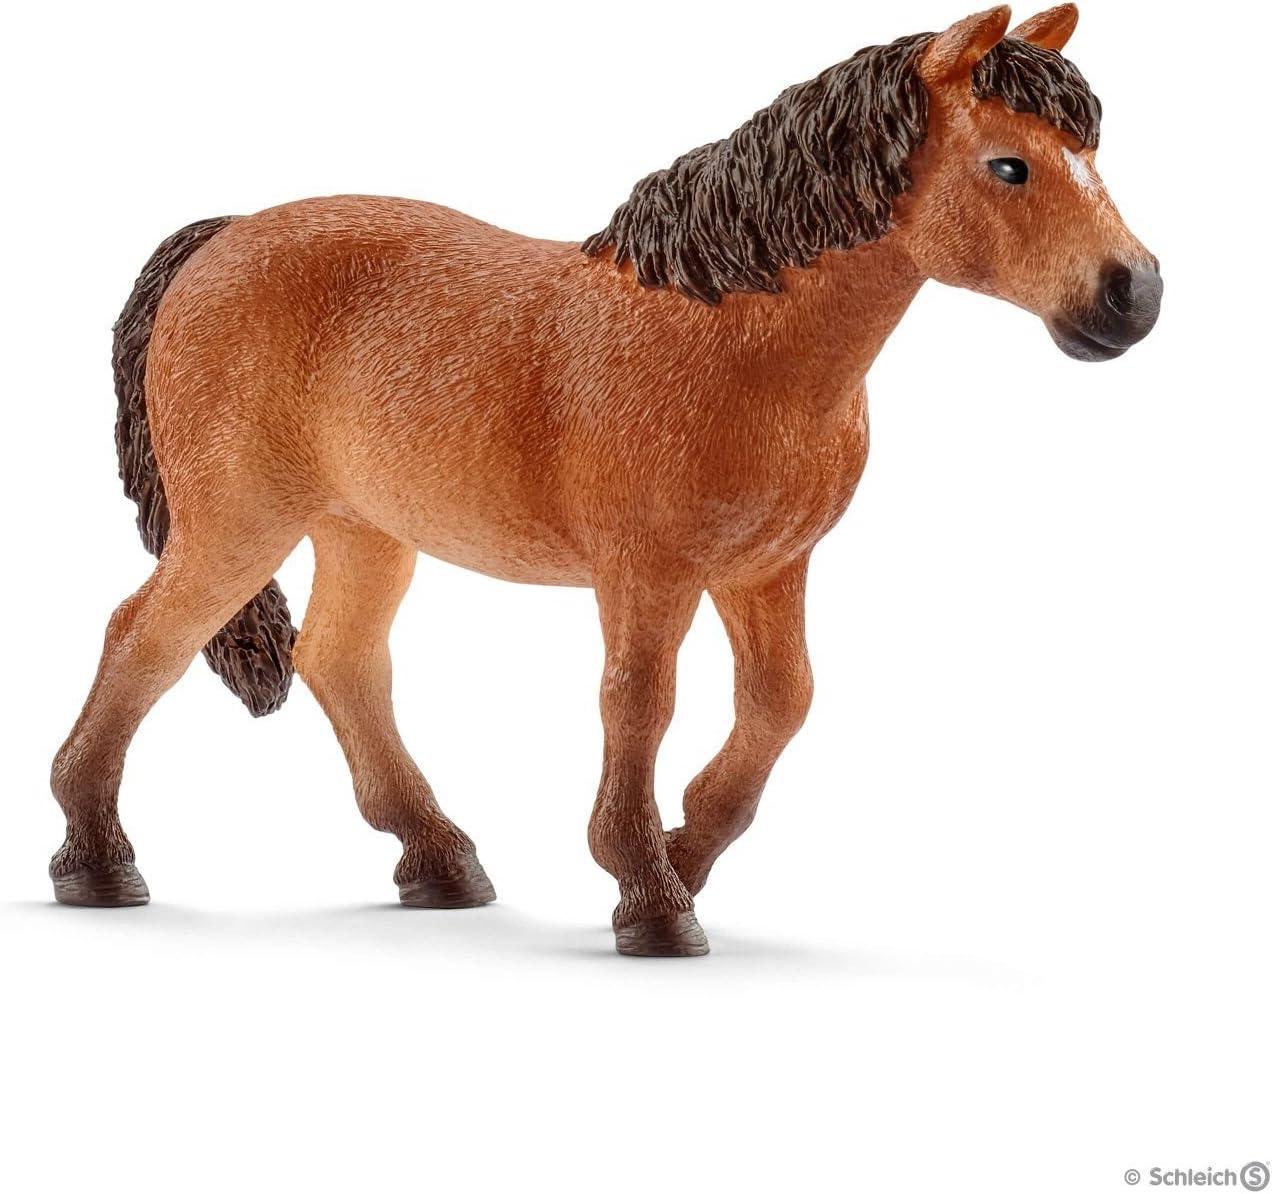 SCHLEICH CAVALLI Dartmoor pony giumenta 13873 NUOVO